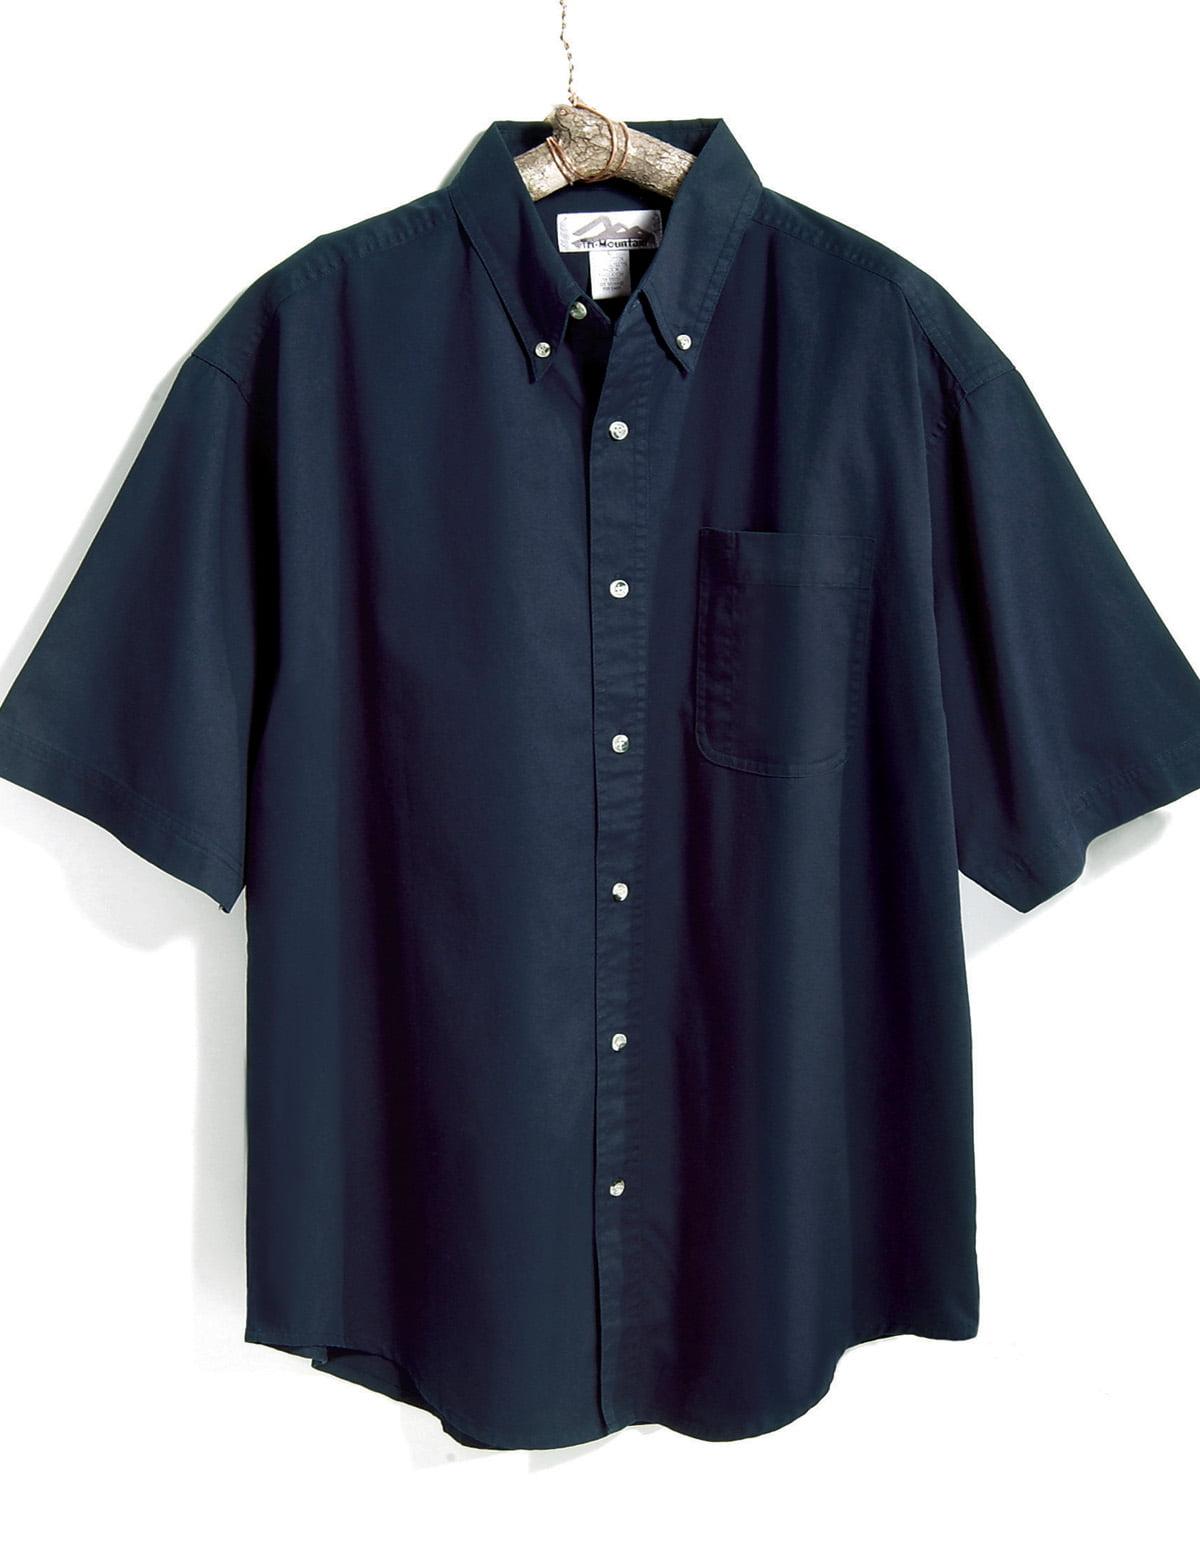 Tri-Mountain Recruit 768 Stain Resistant Short Sleeve Shirt, 2X-Large, Black